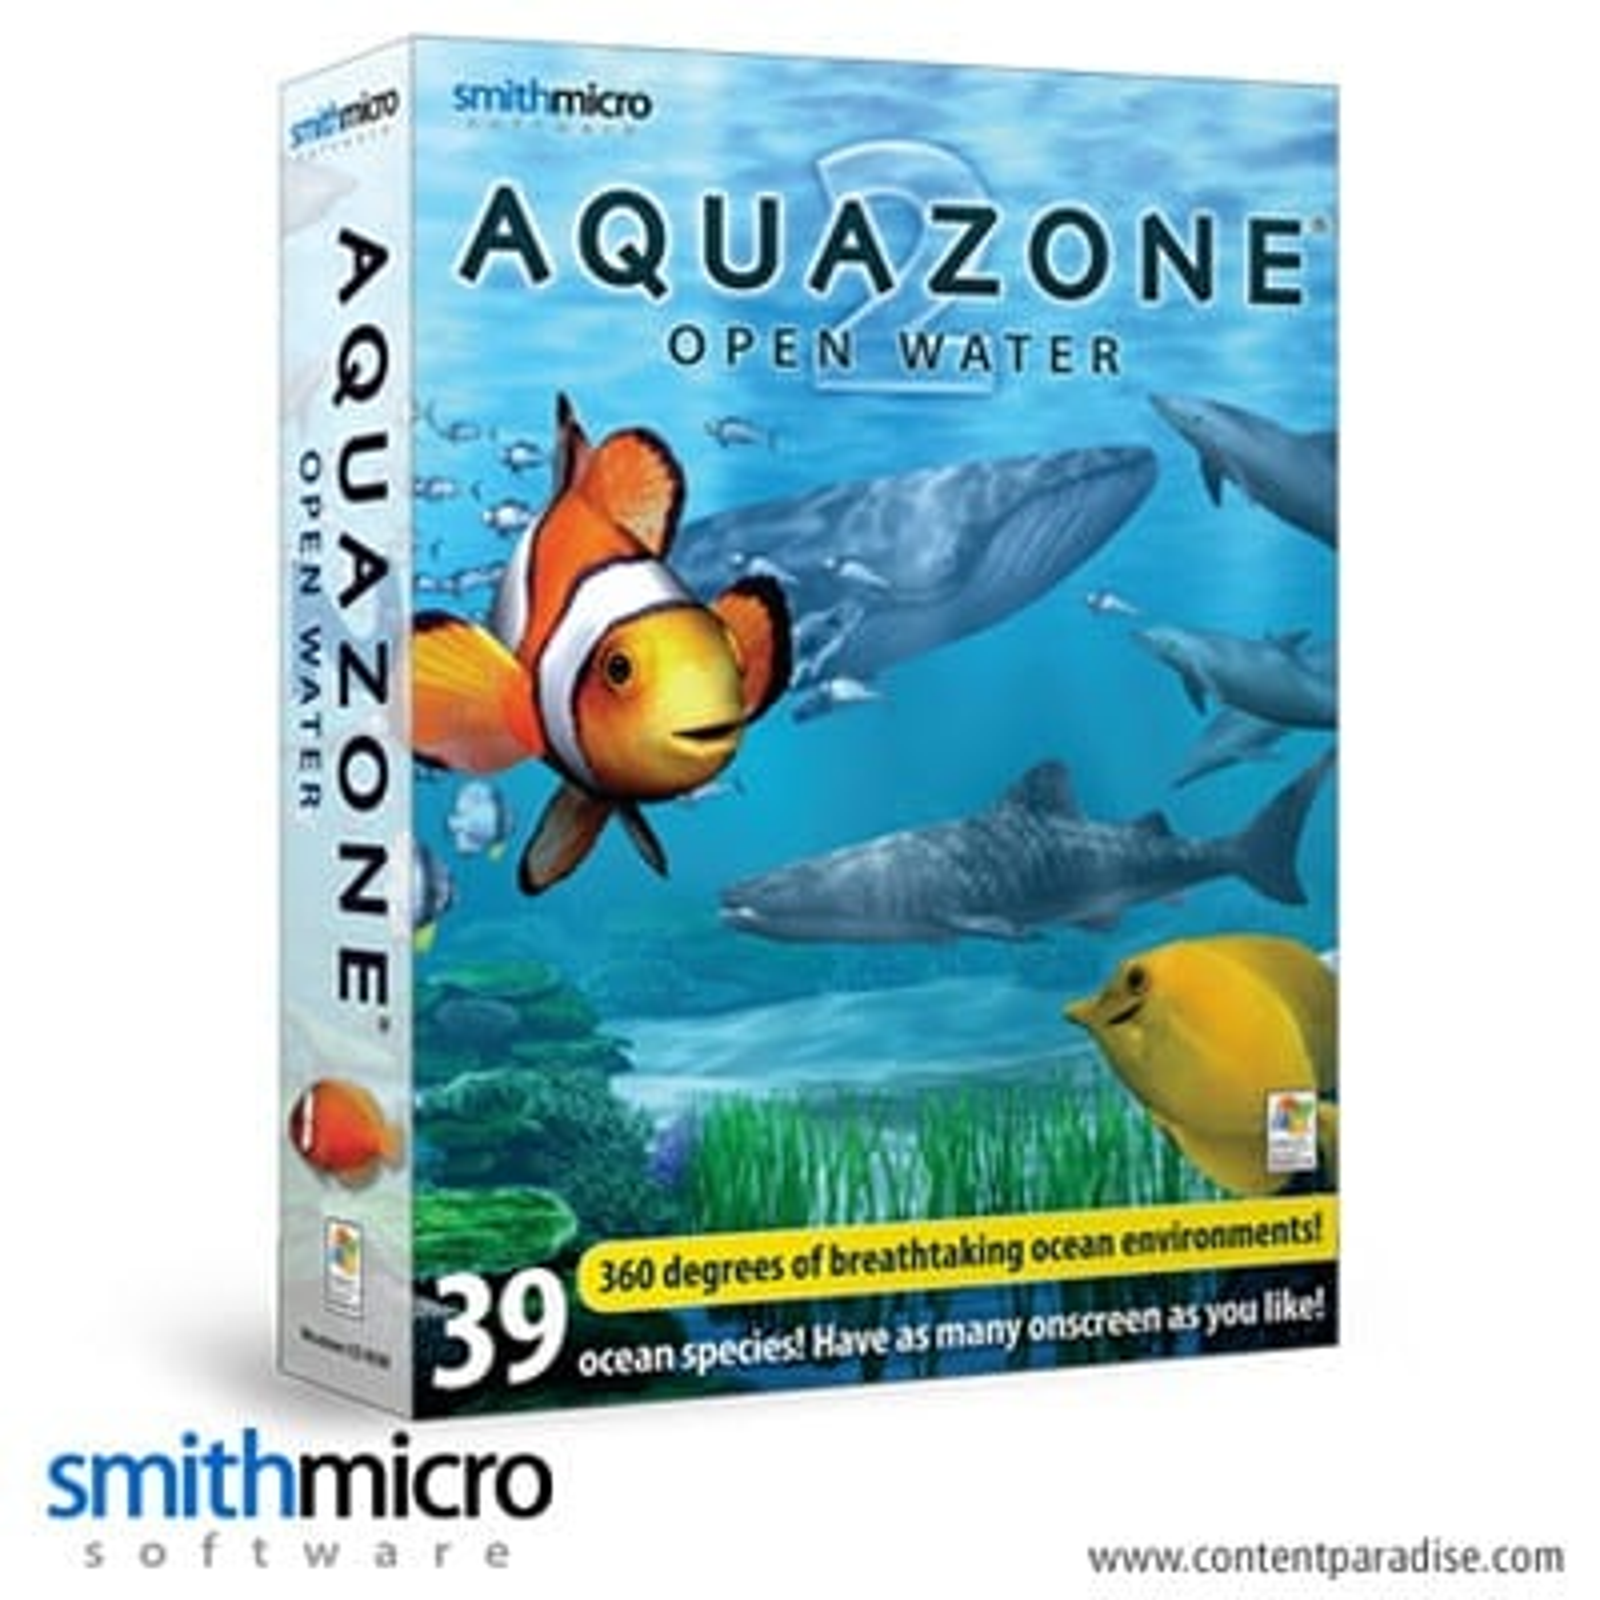 Aquazone 2: Open Water